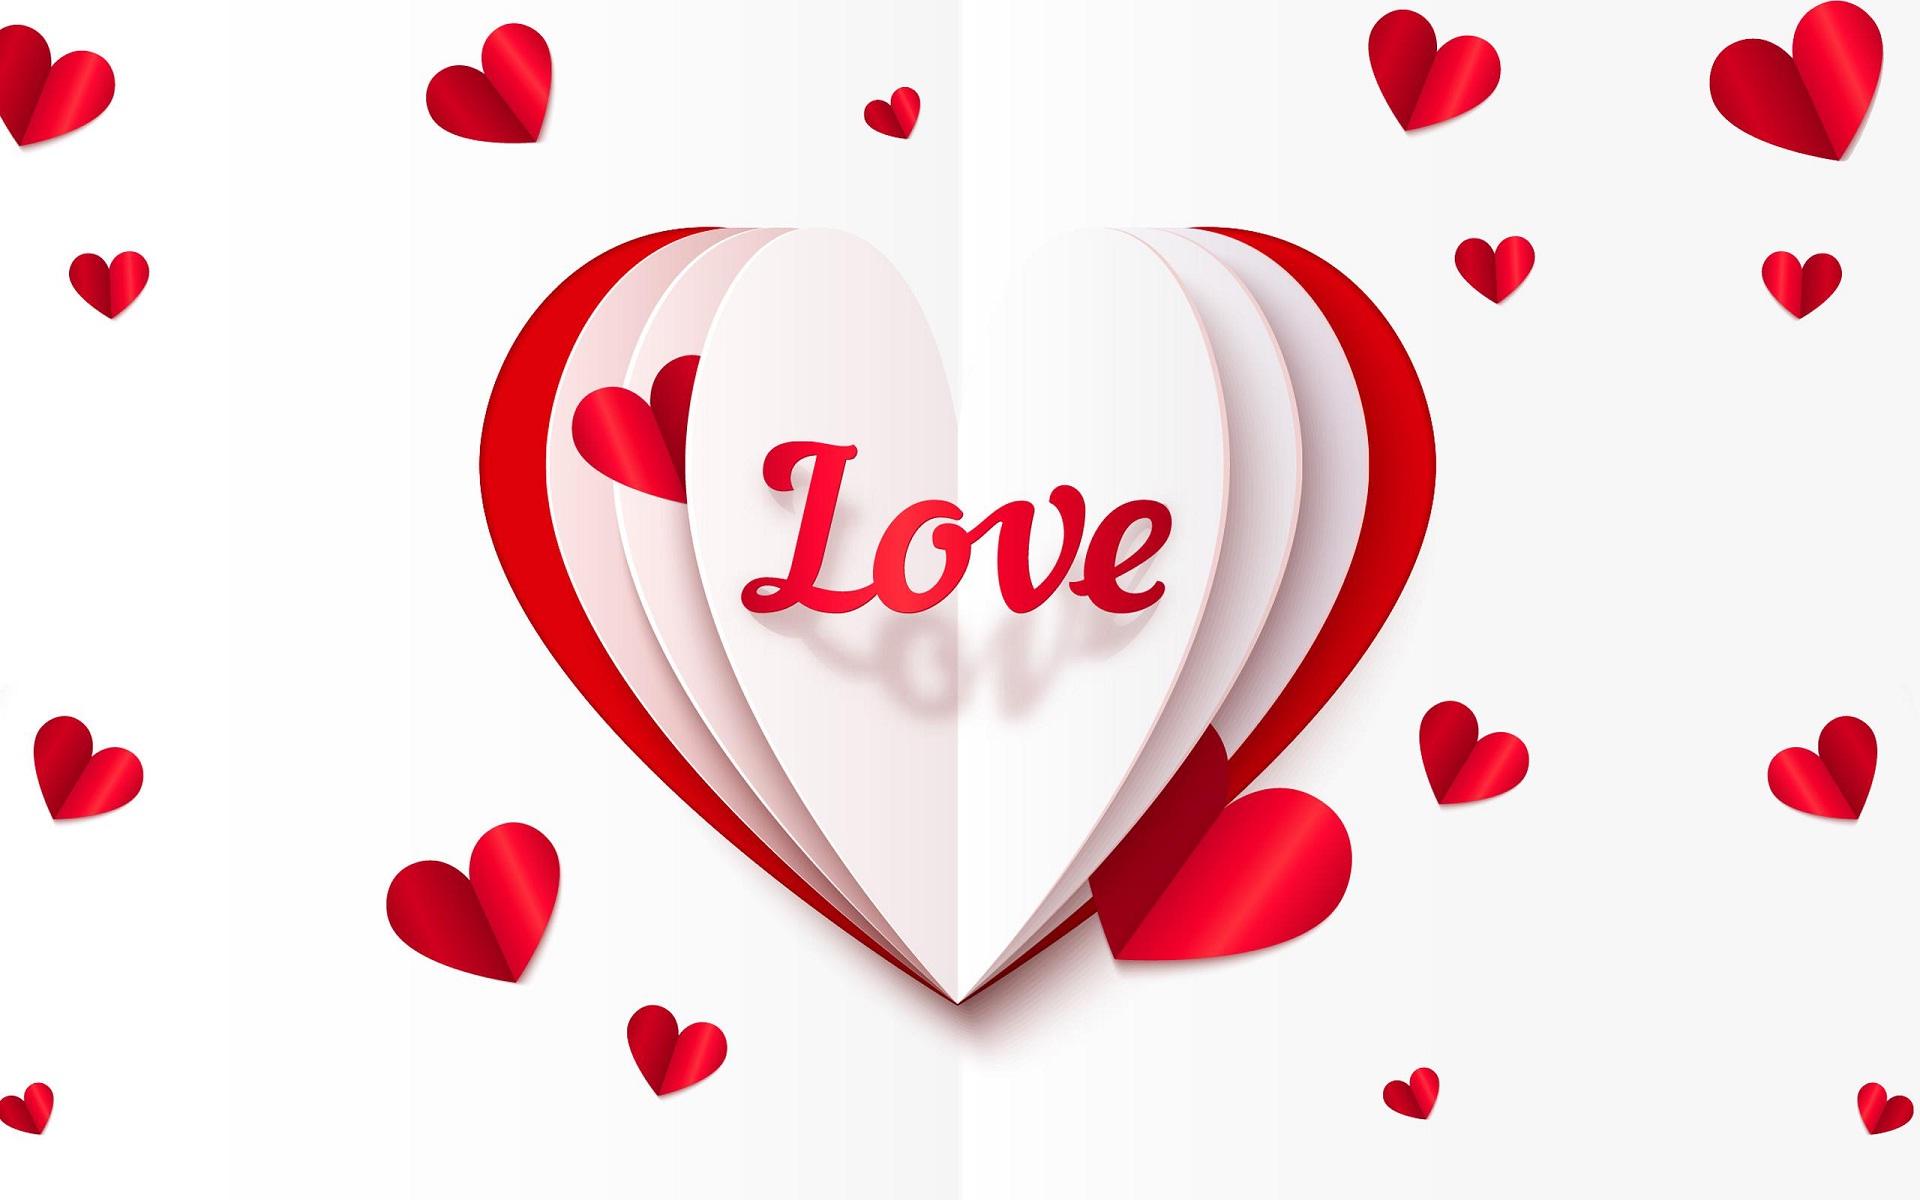 Love Heart Wallpaper Hd: 1920x1200px Heart Shape Wallpaper